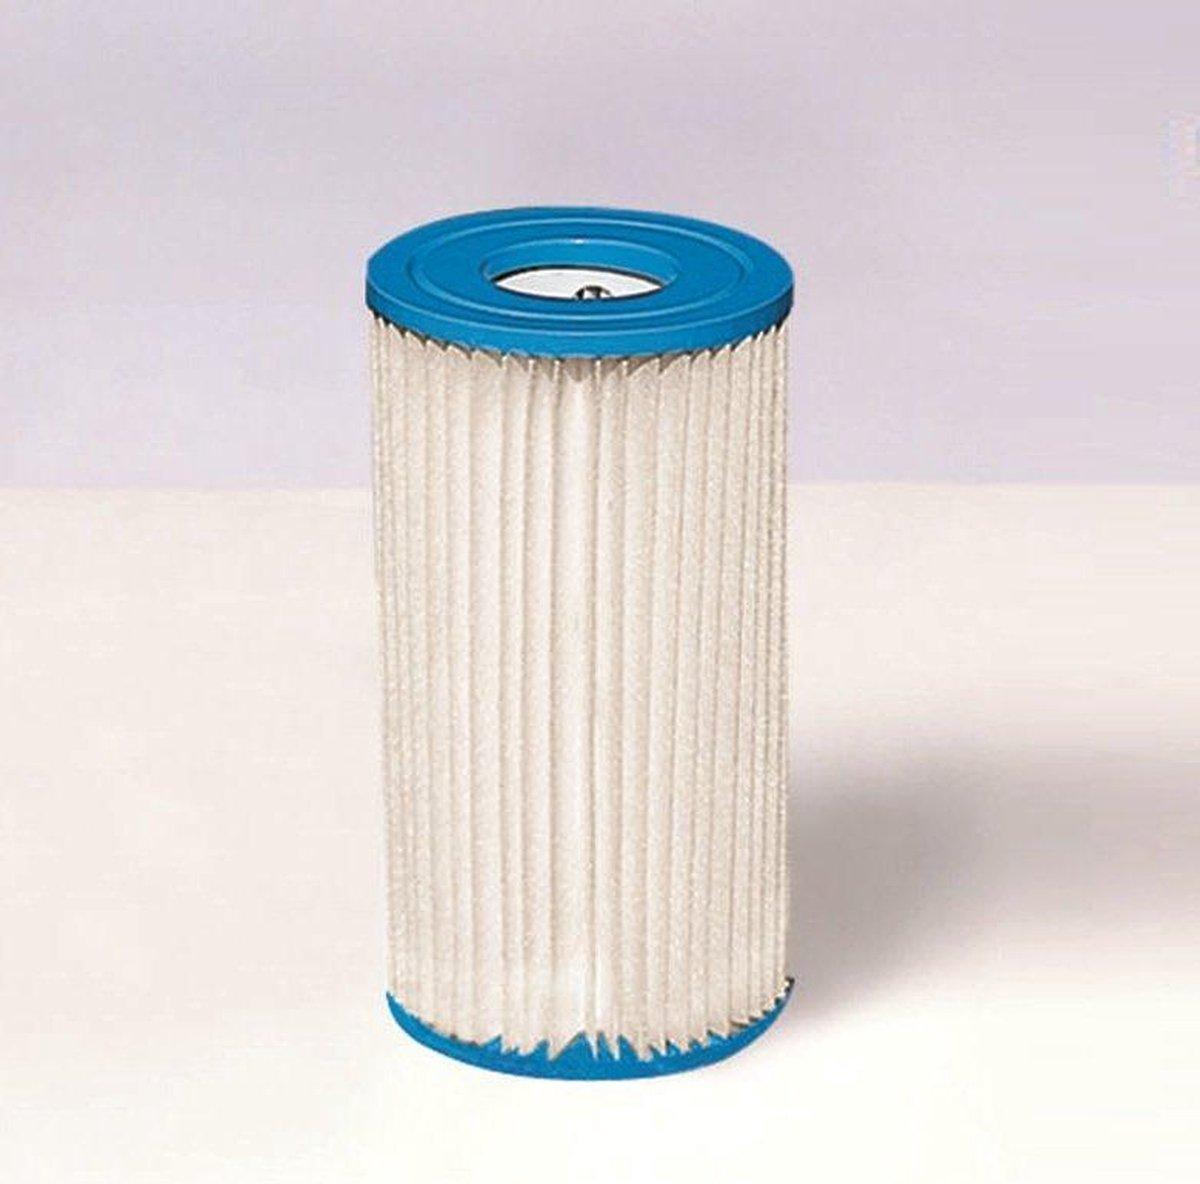 Intex filtercartridge klein 2-pack